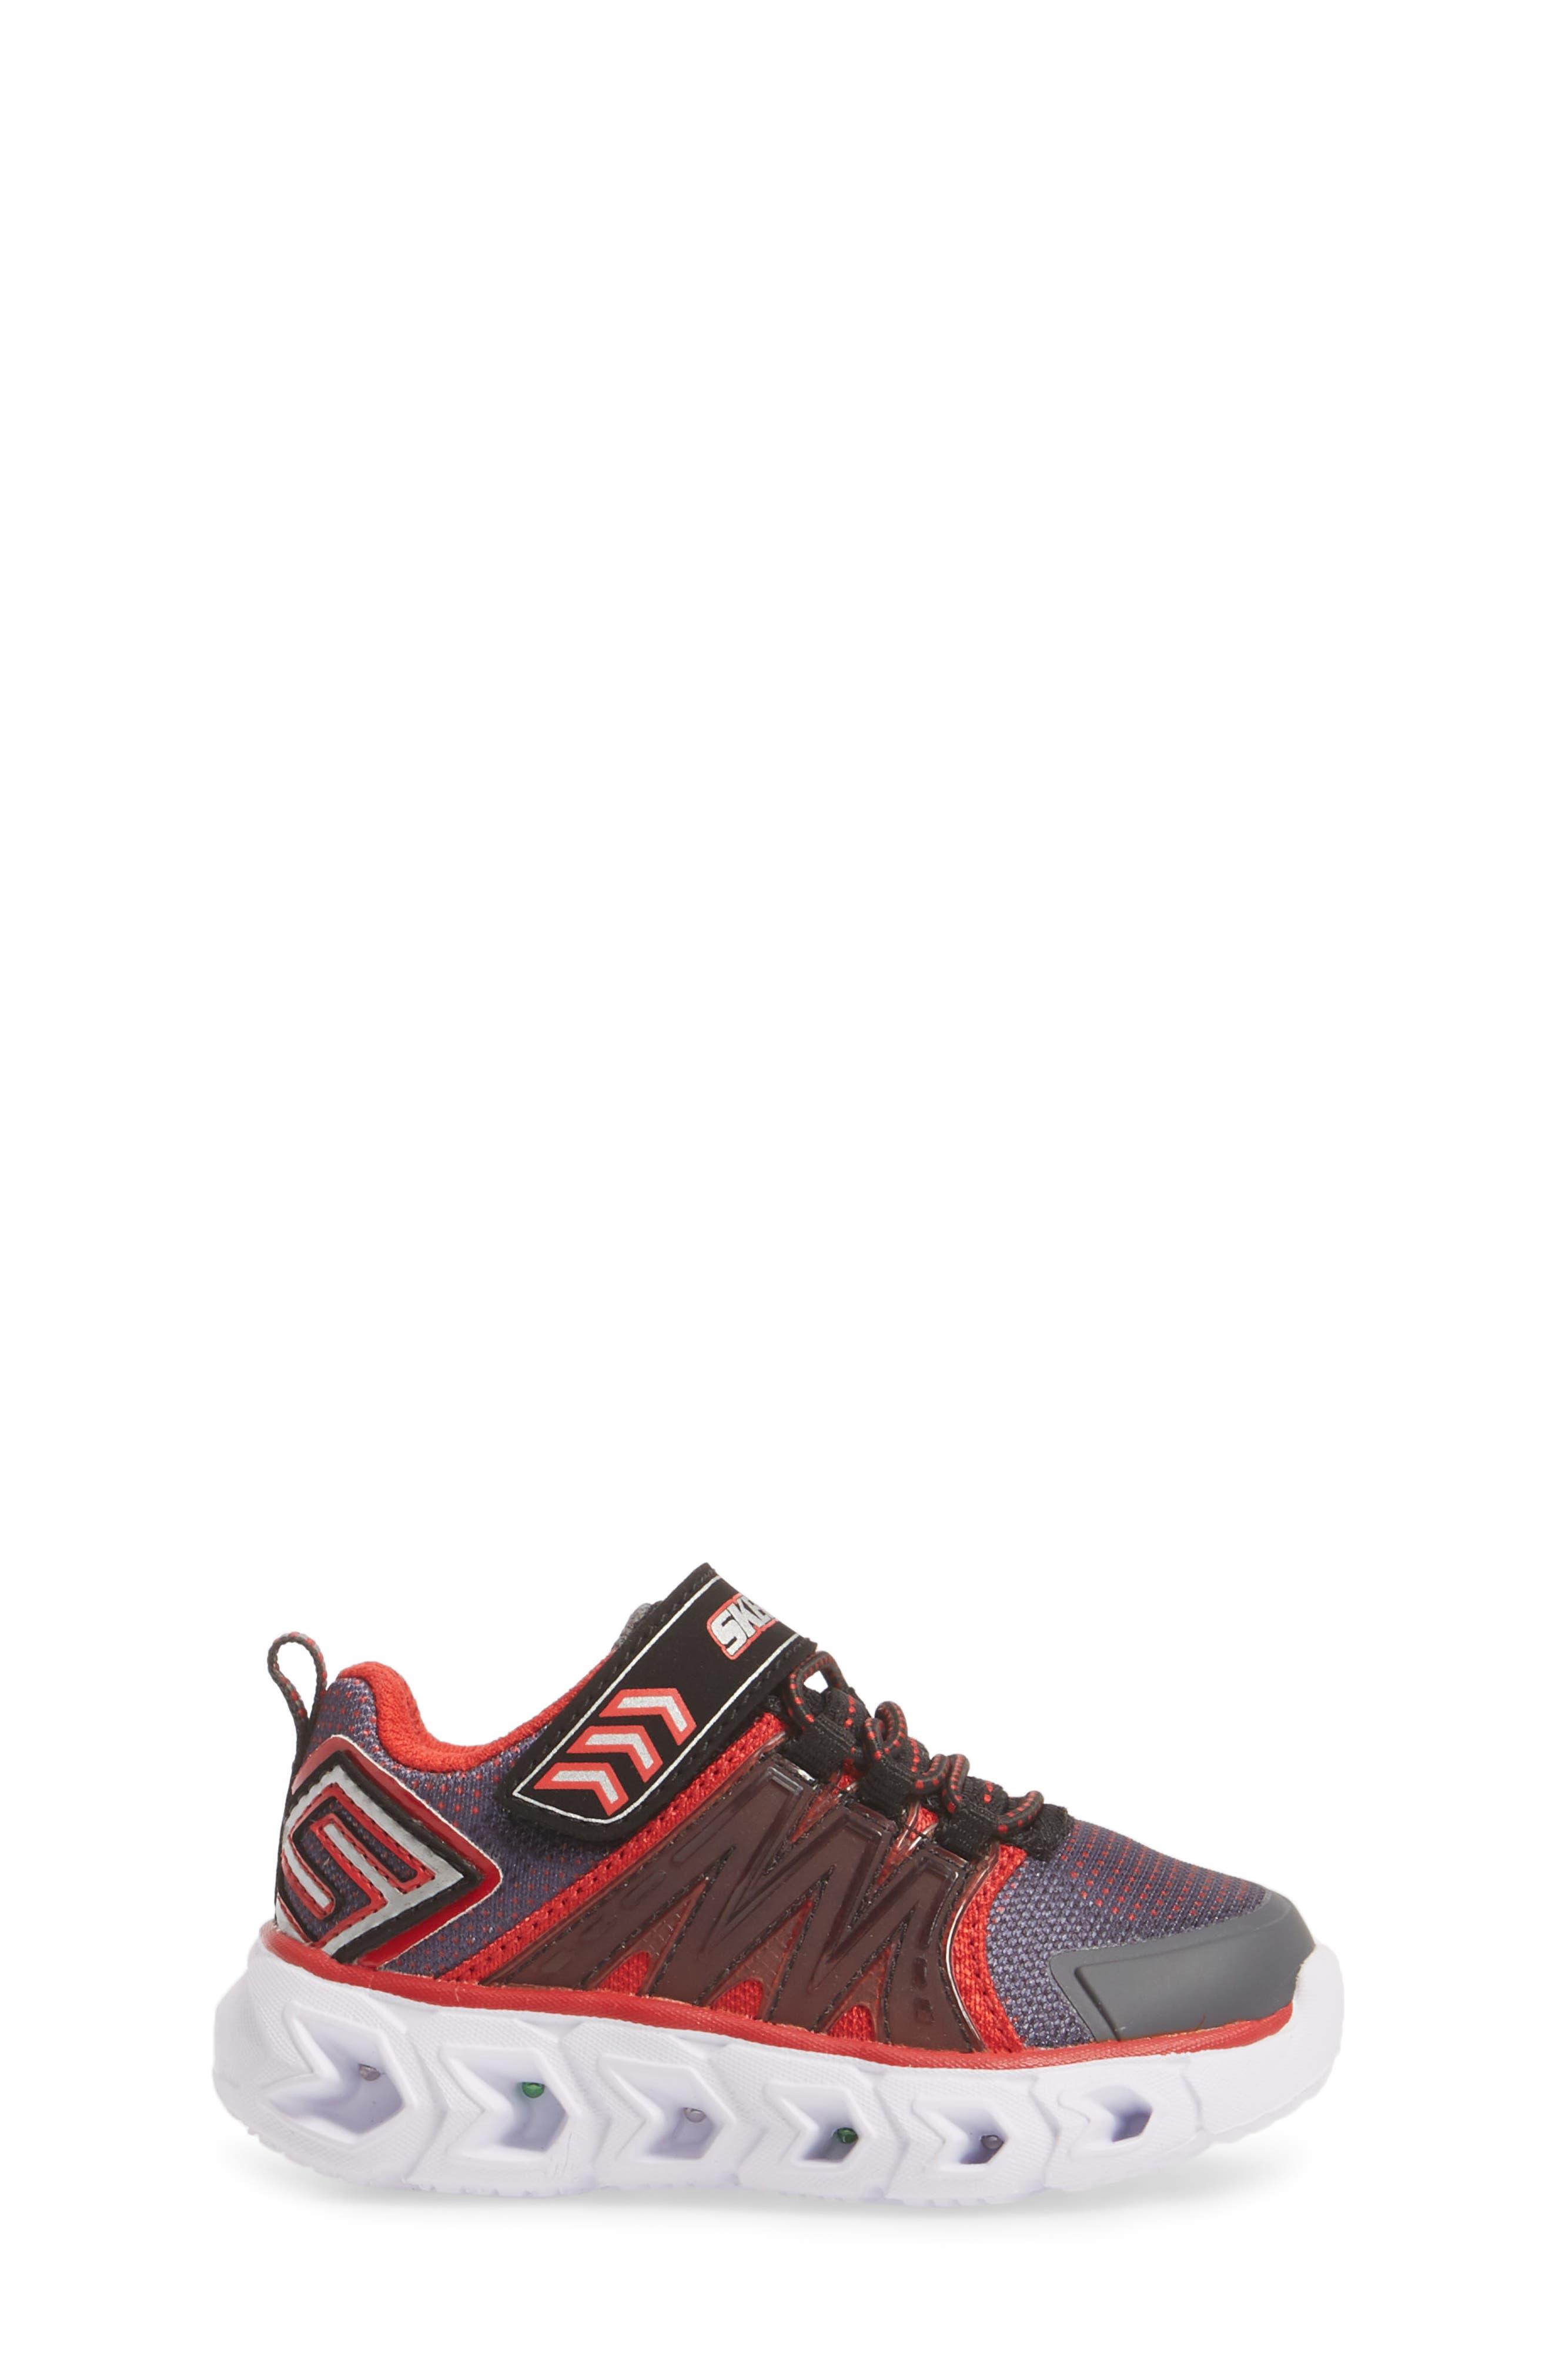 Hypno-Flash 2.0 Sneakers,                             Alternate thumbnail 6, color,